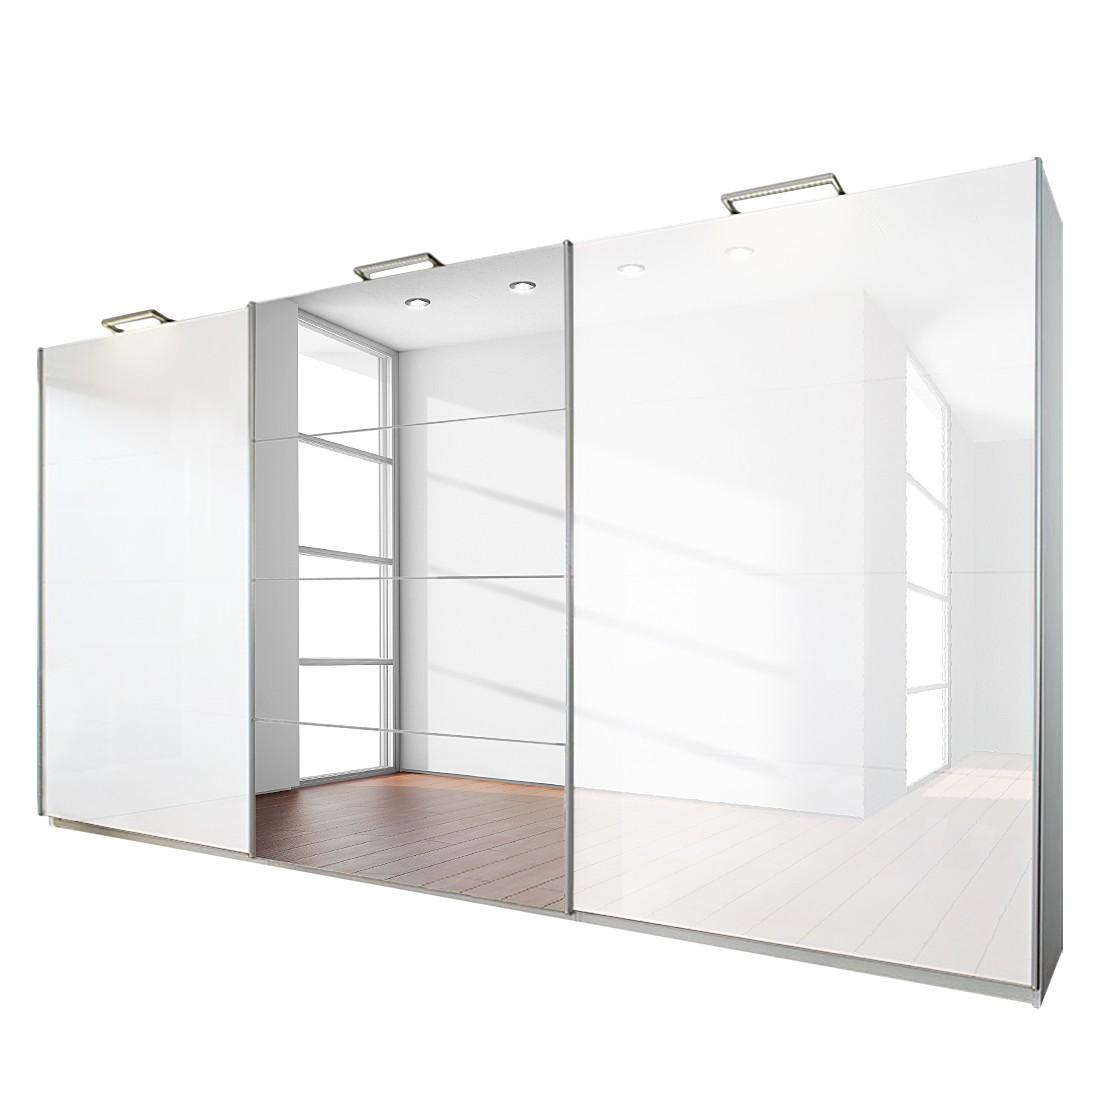 Armoire à portes coulissantes Beluga Plus - Blanc alpin / Blanc brillant - 315 cm (3 portes) - 223 c